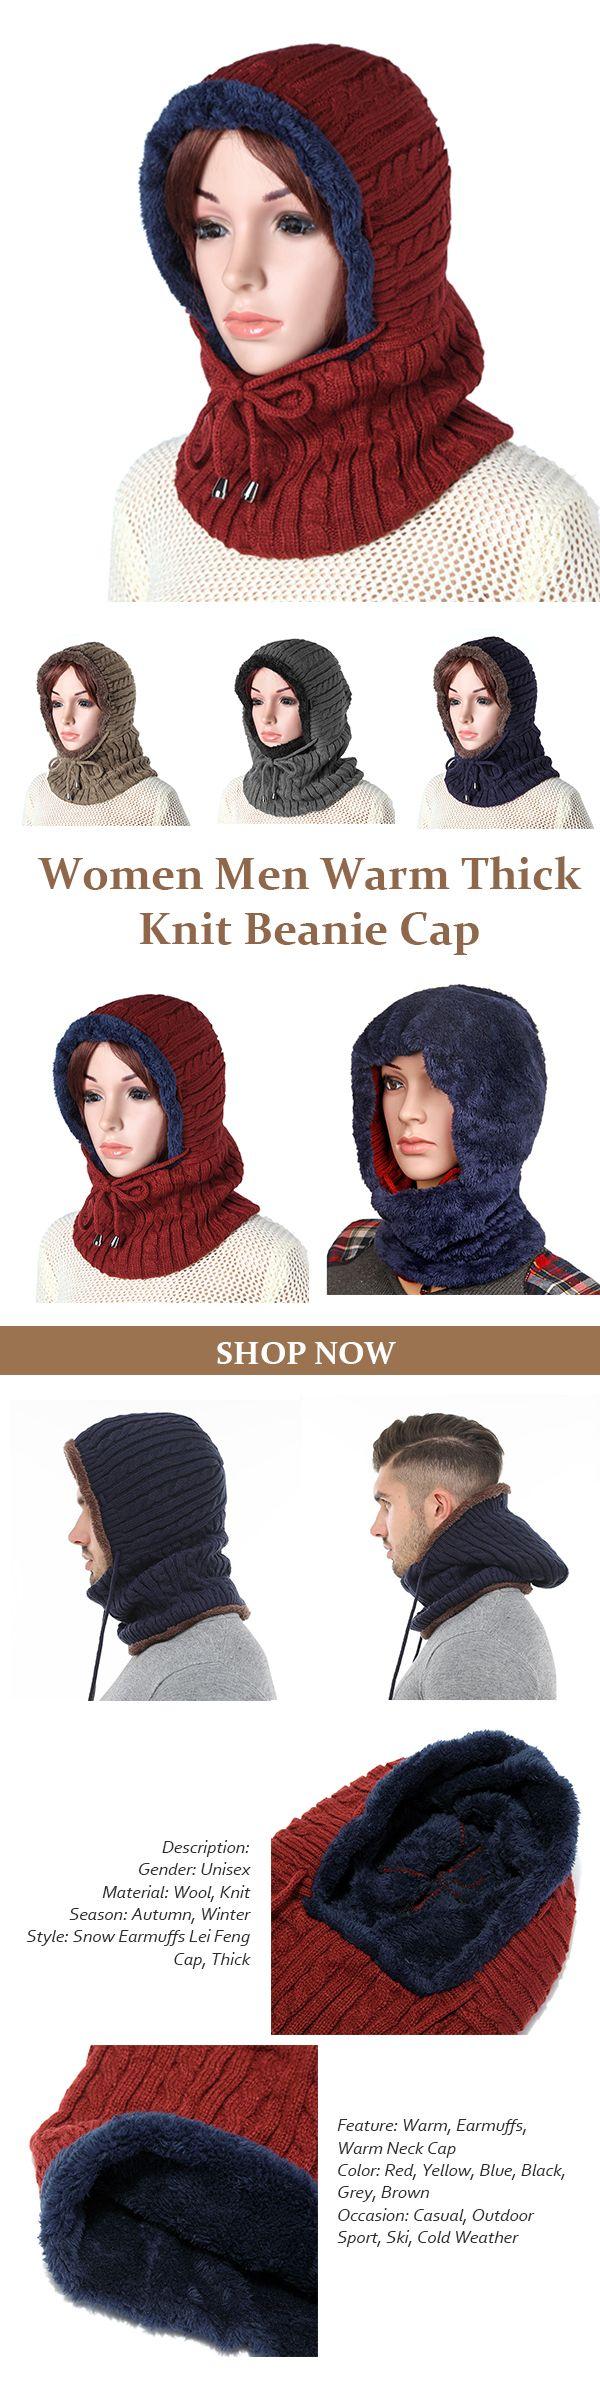 Women Men Warm Thick Knit Beanie Cap With Earmuffs Hooded Scarf ...